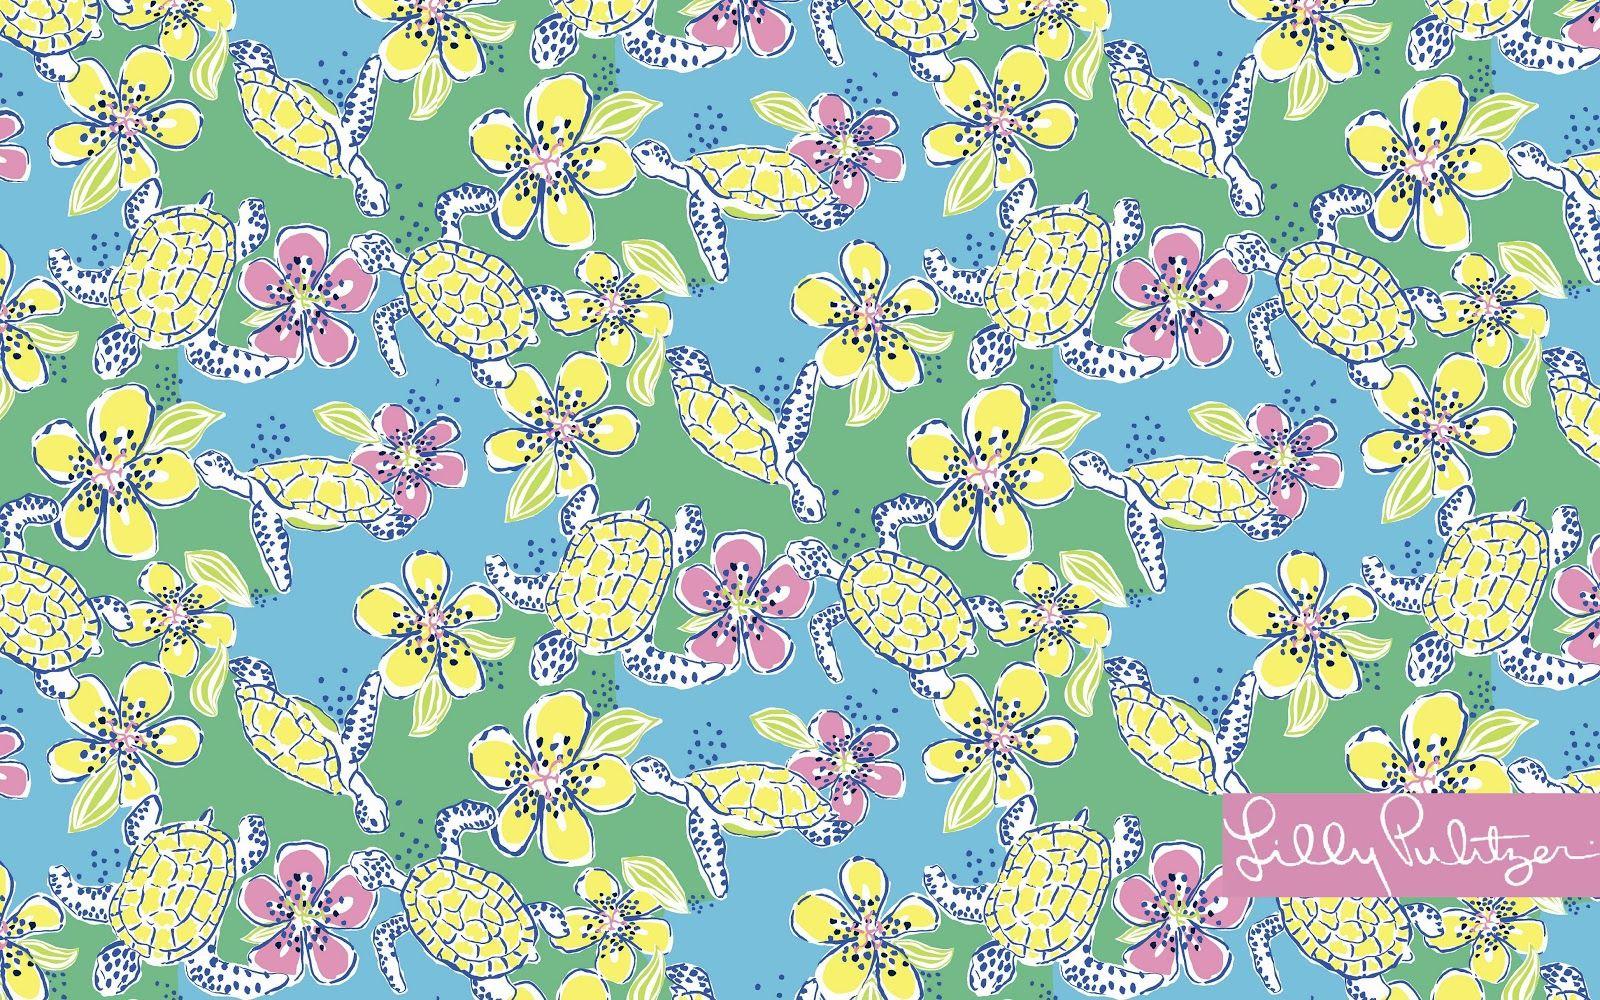 Fall Southern Prep Wallpapers Lilly Desktop Wallpaper Http Canadianprep Blogspot Com